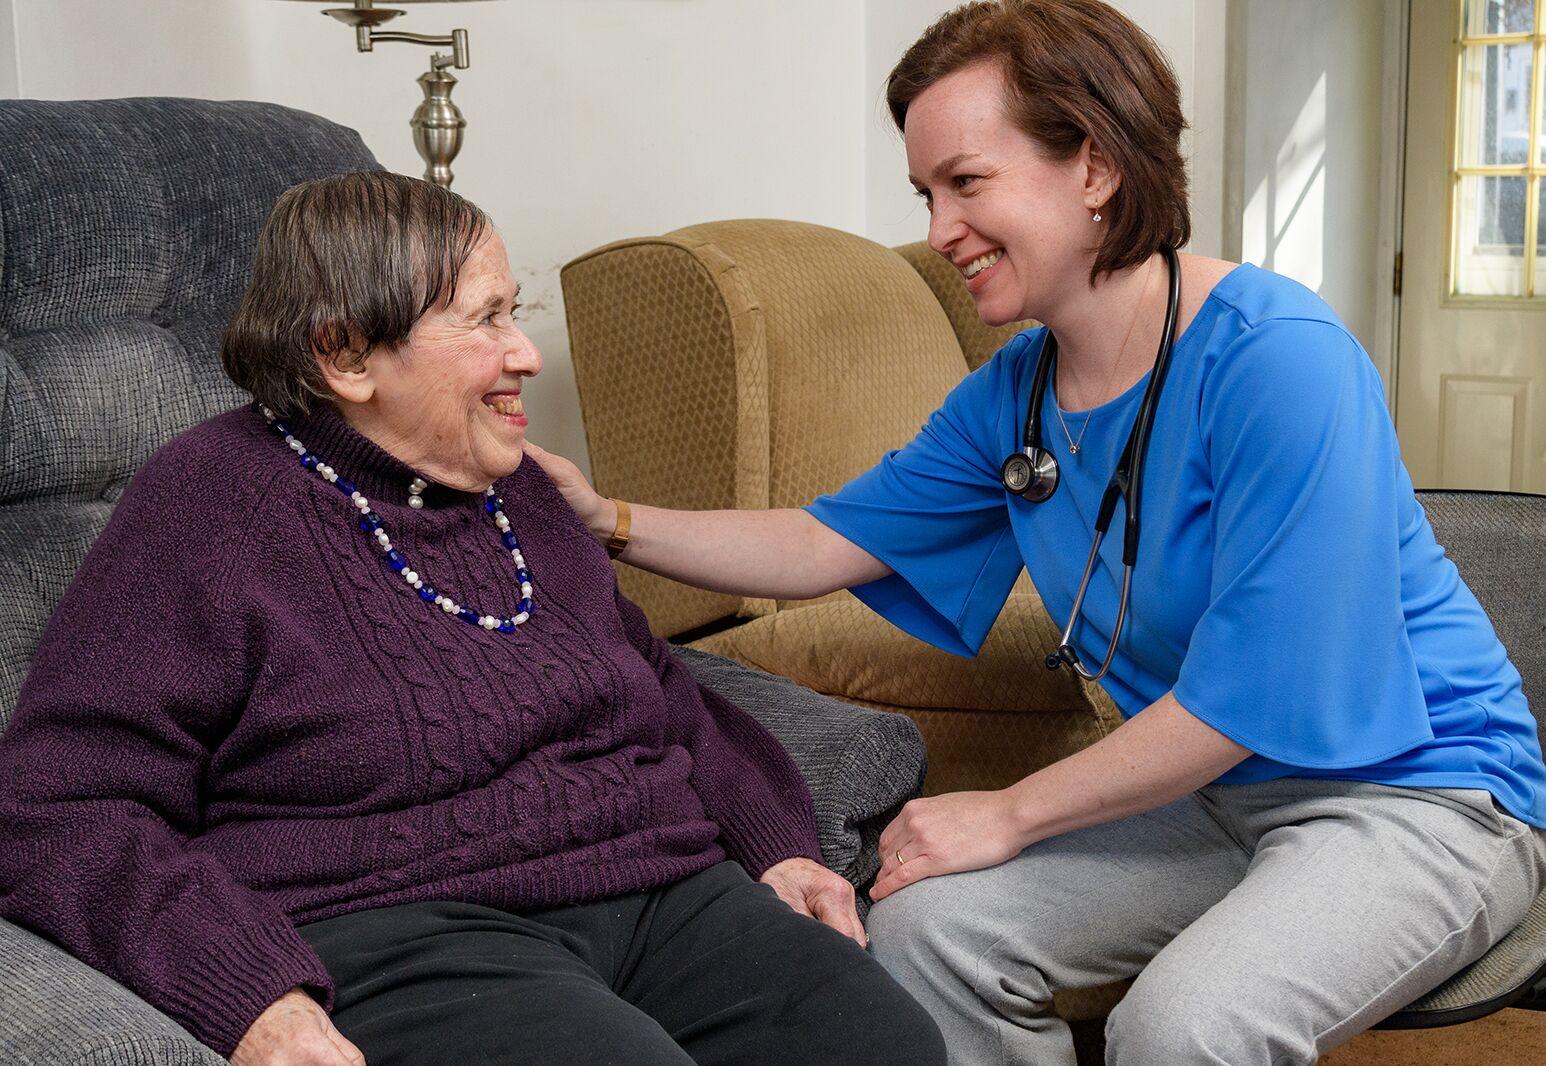 Dr. Karen Abrashkin, medical director of Northwell's House Calls program, greets her patient Rose Katz, 83, in her home.